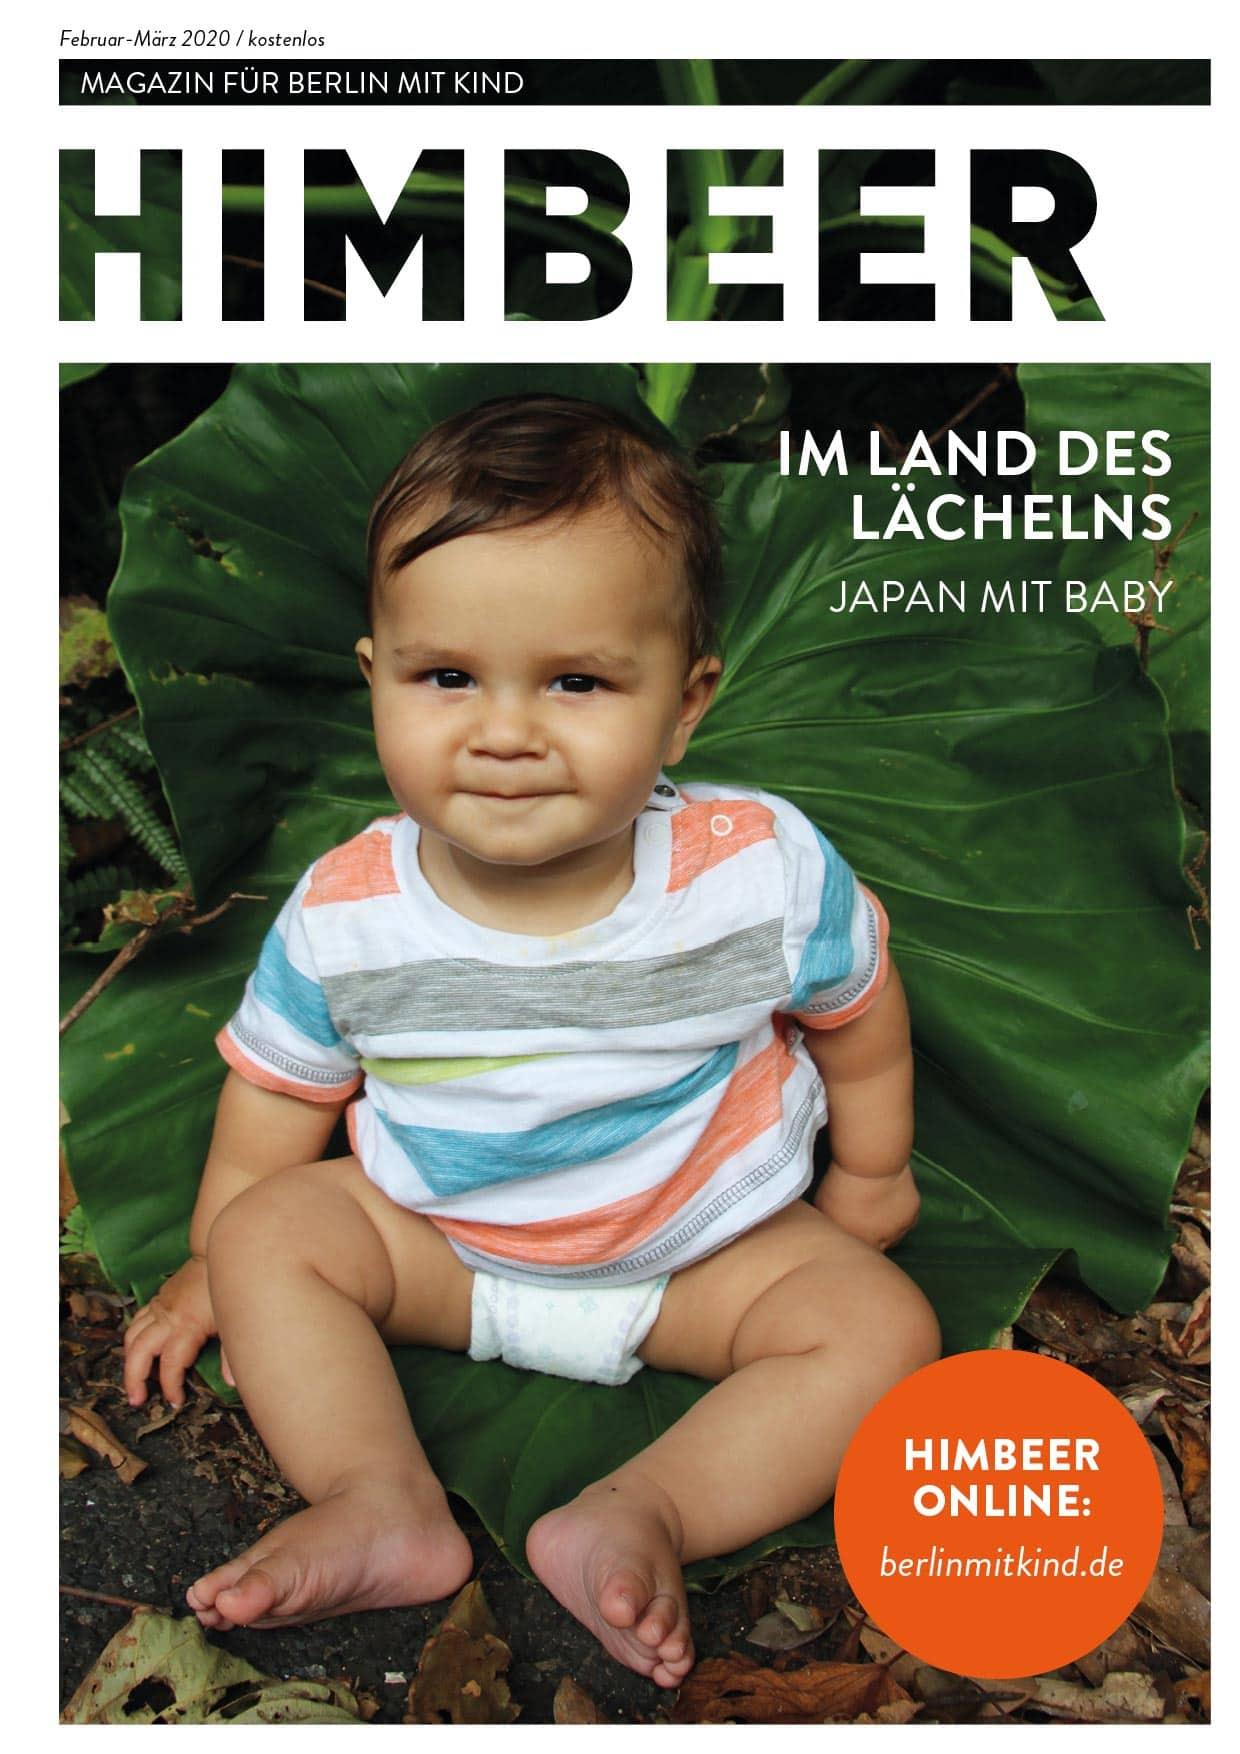 Familienmagazin HIMBEER Berlin mit Kind Februar März 2020 // HIMBEER